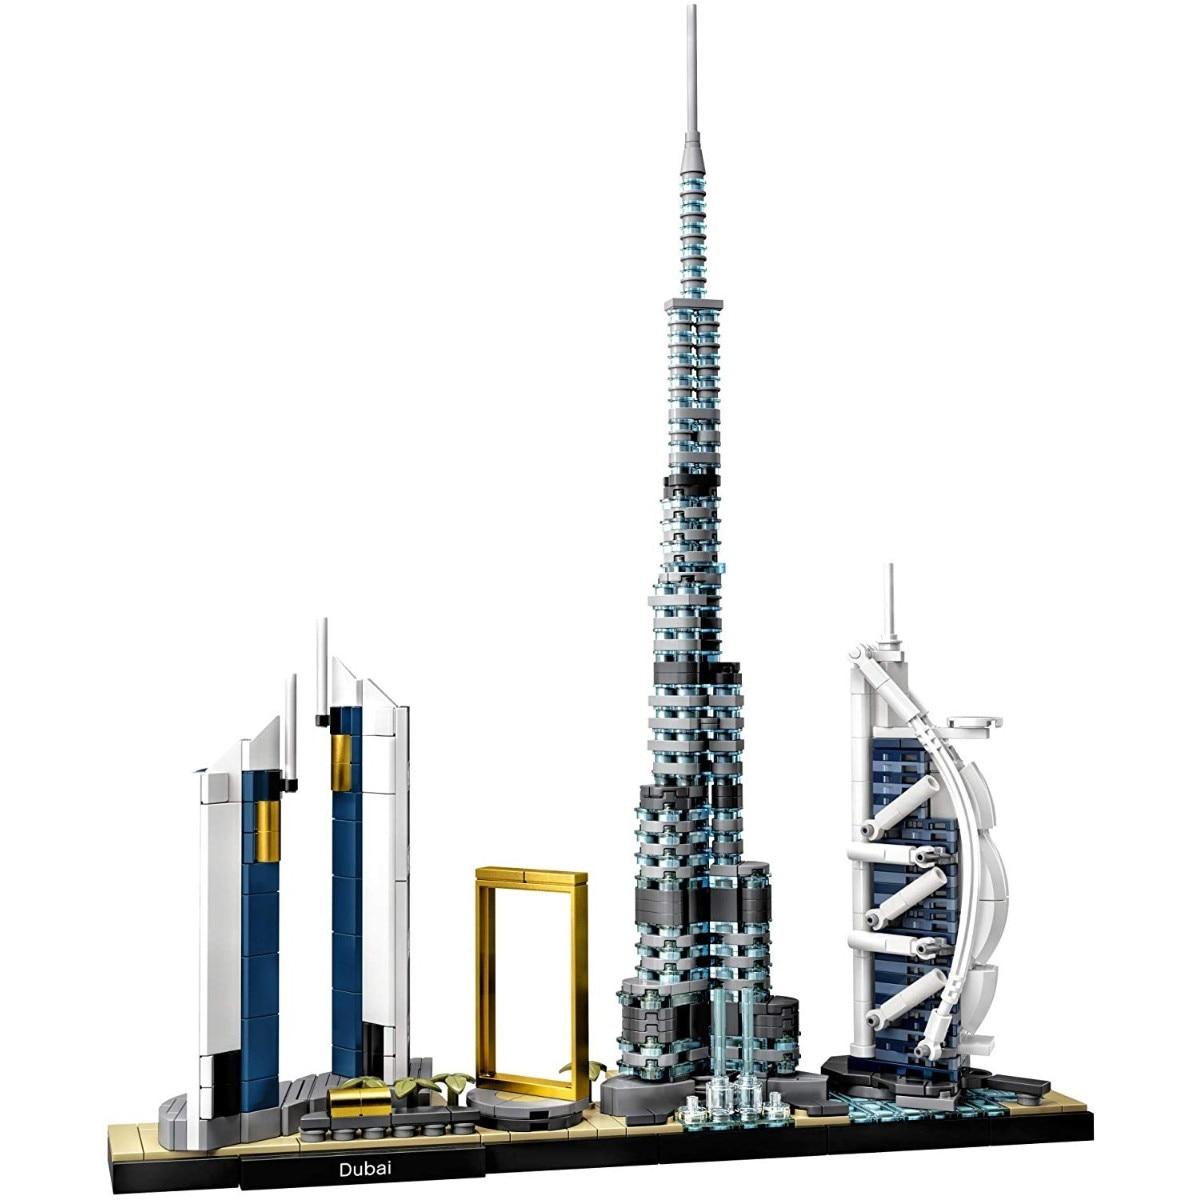 Dubai - Hasznos információk / plastenka.hu